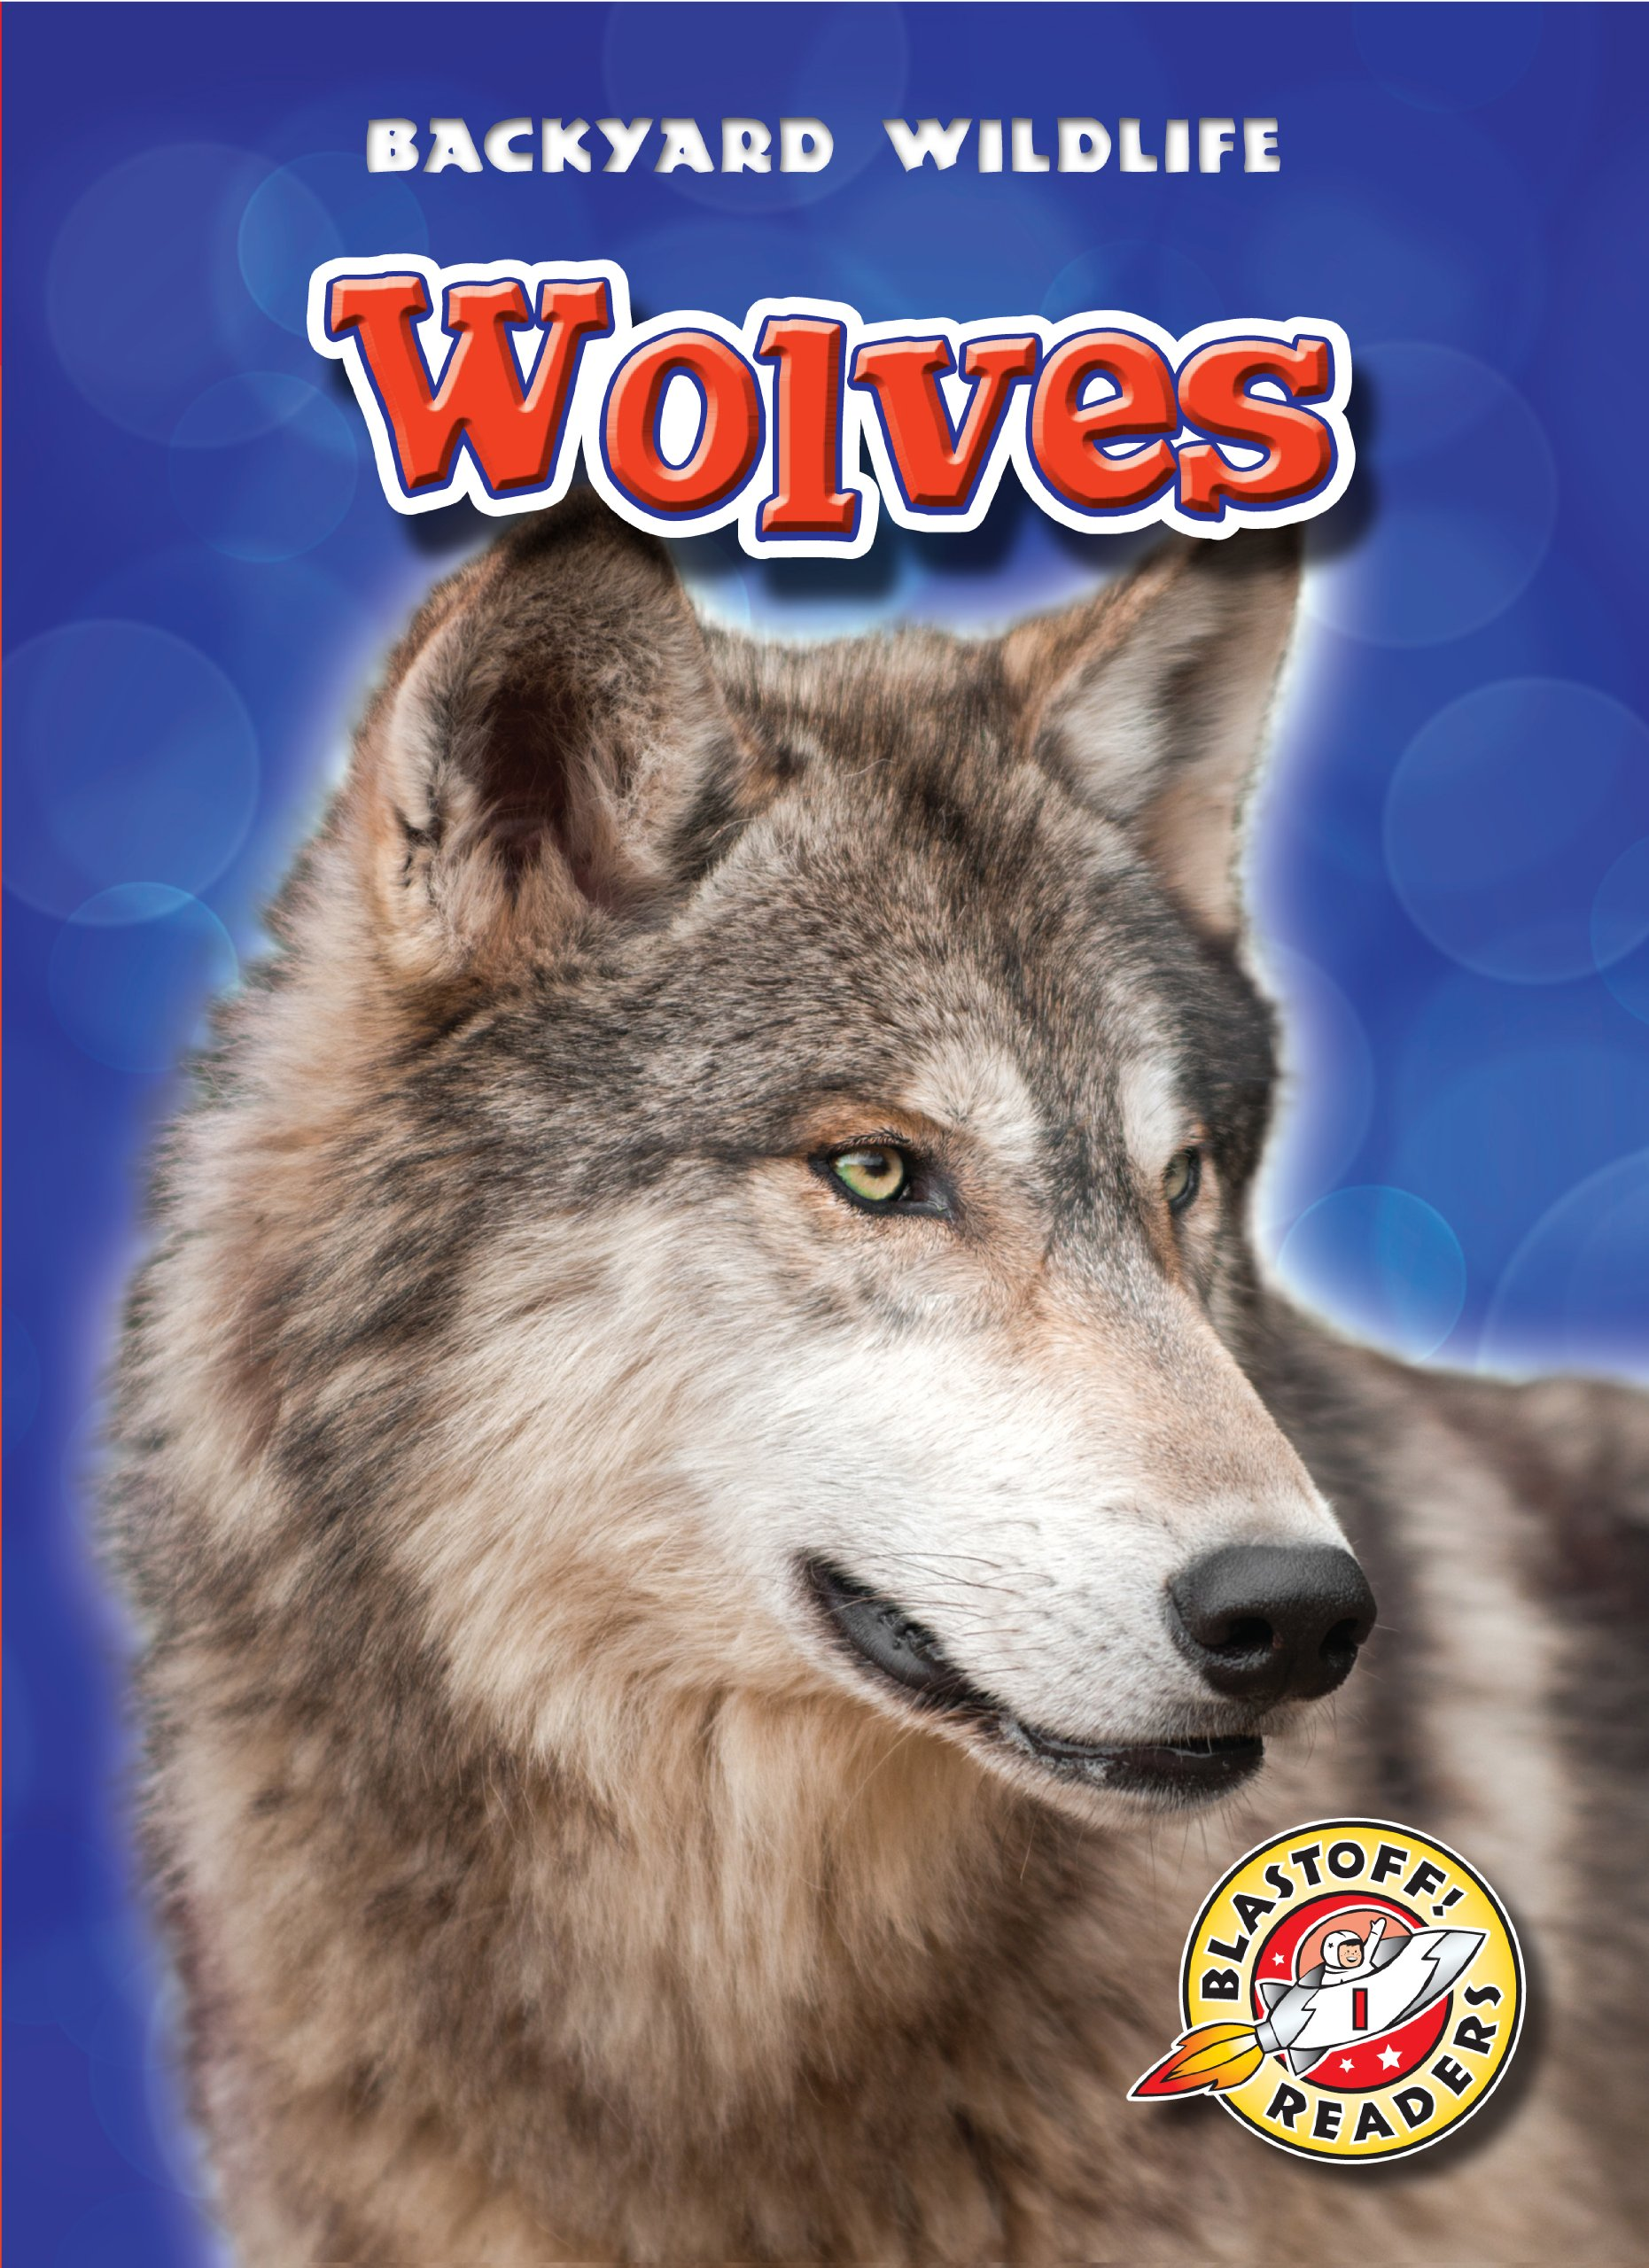 Wolves (Blastoff! Readers: Backyard Wildlife) (Blastoff Readers. Level 1)